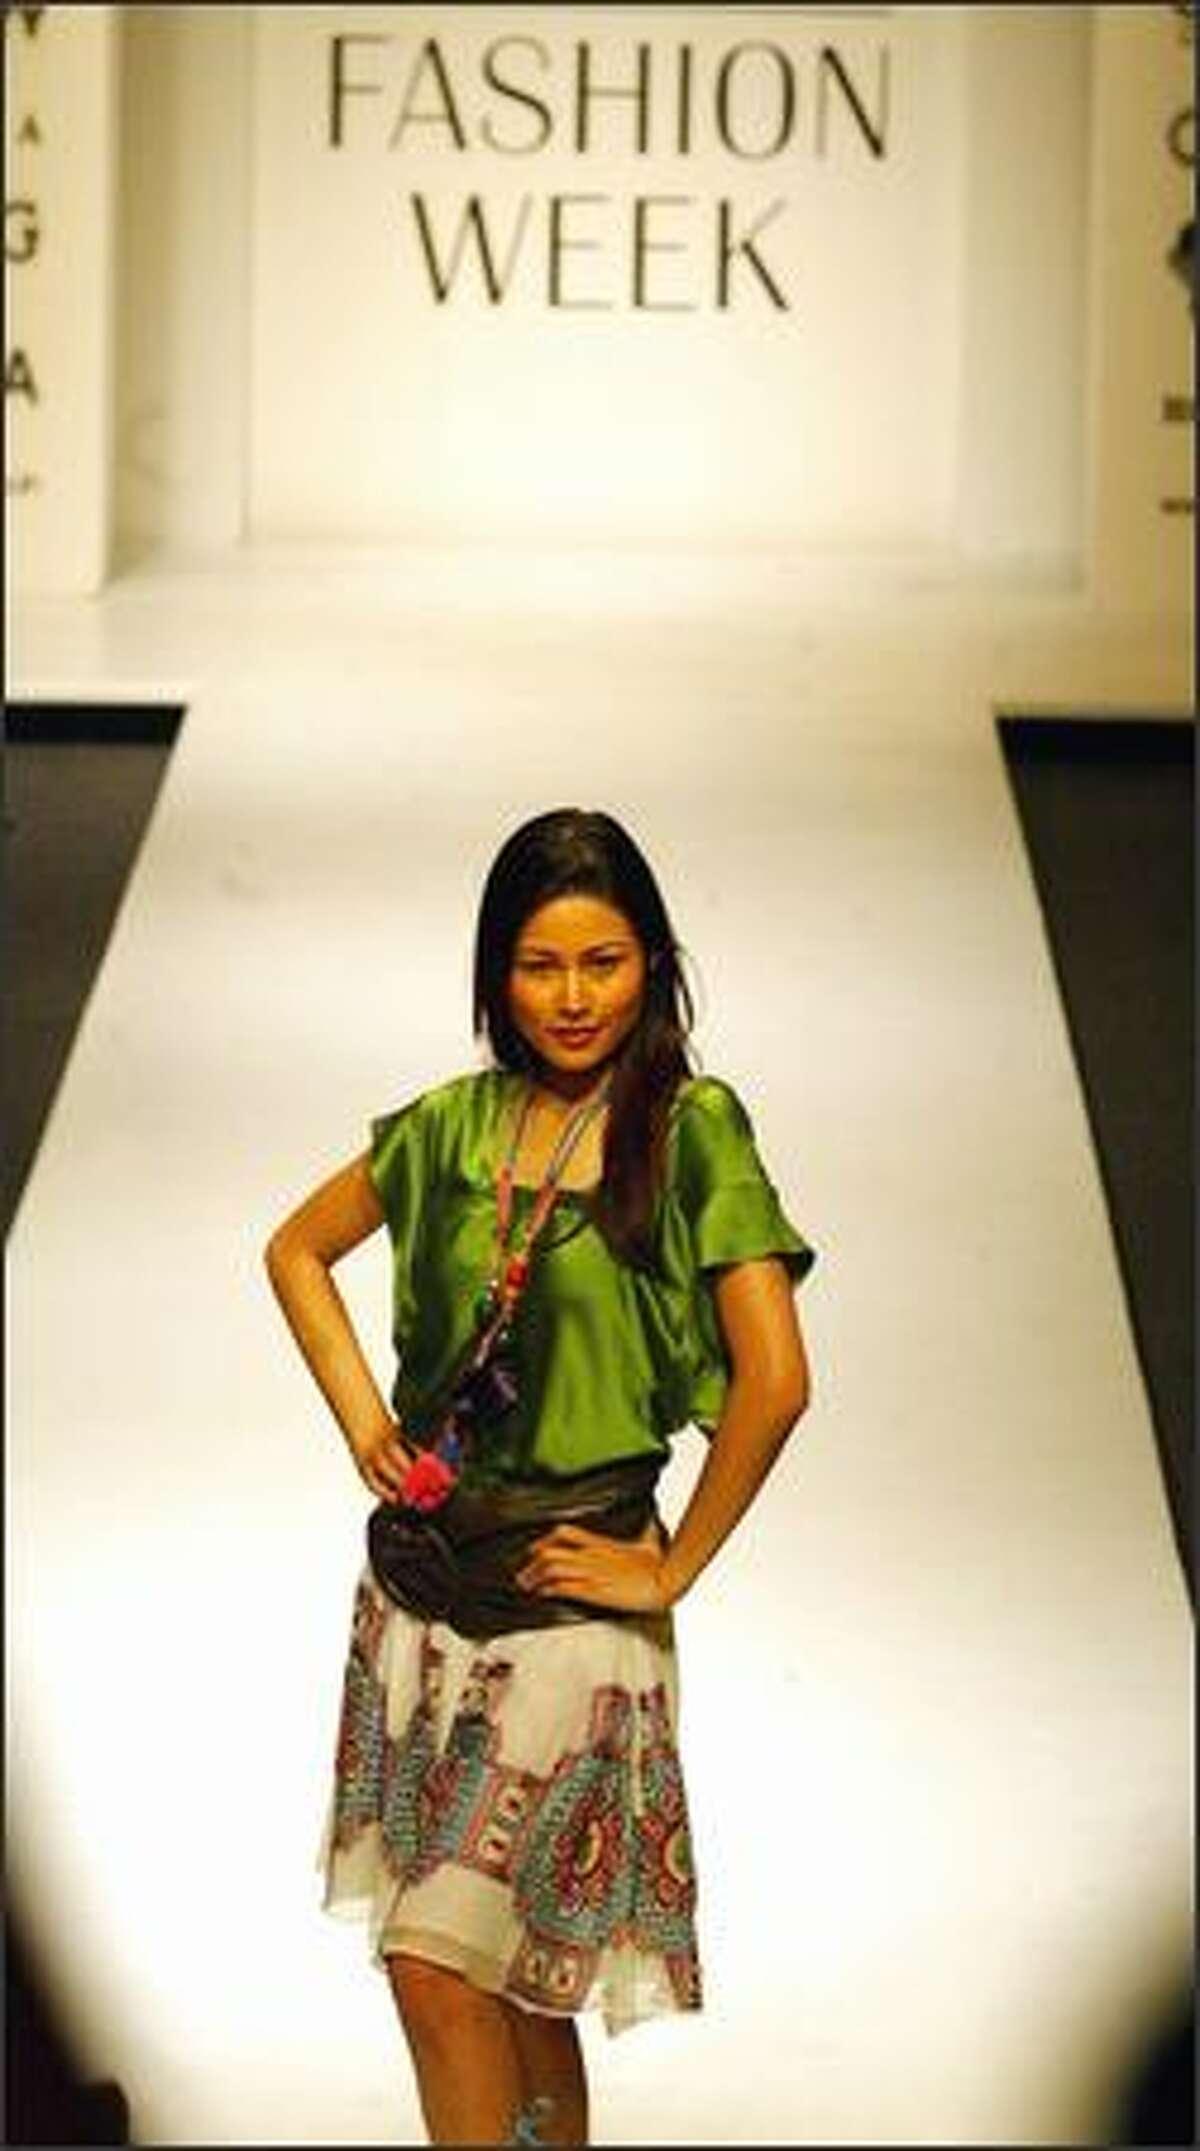 A model presents a creation of designer Vineet Bahi at the Lakme Fashion Week in Mumbai, India, Tuesday. (AP Photo/Rajesh Nirgude)